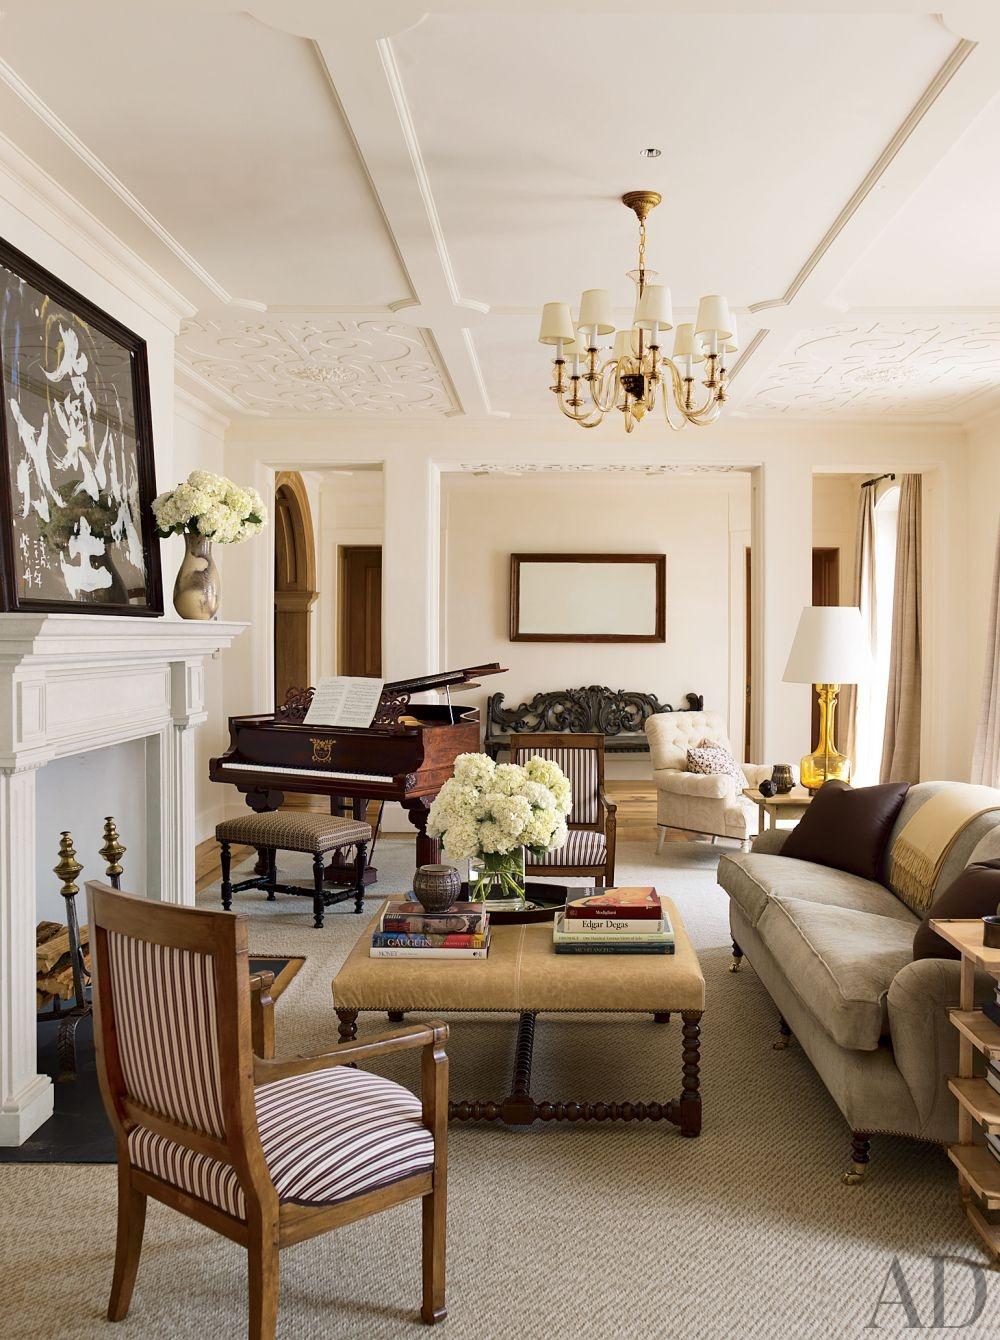 25 Traditional Living Room Design Ideas  Decoration Love